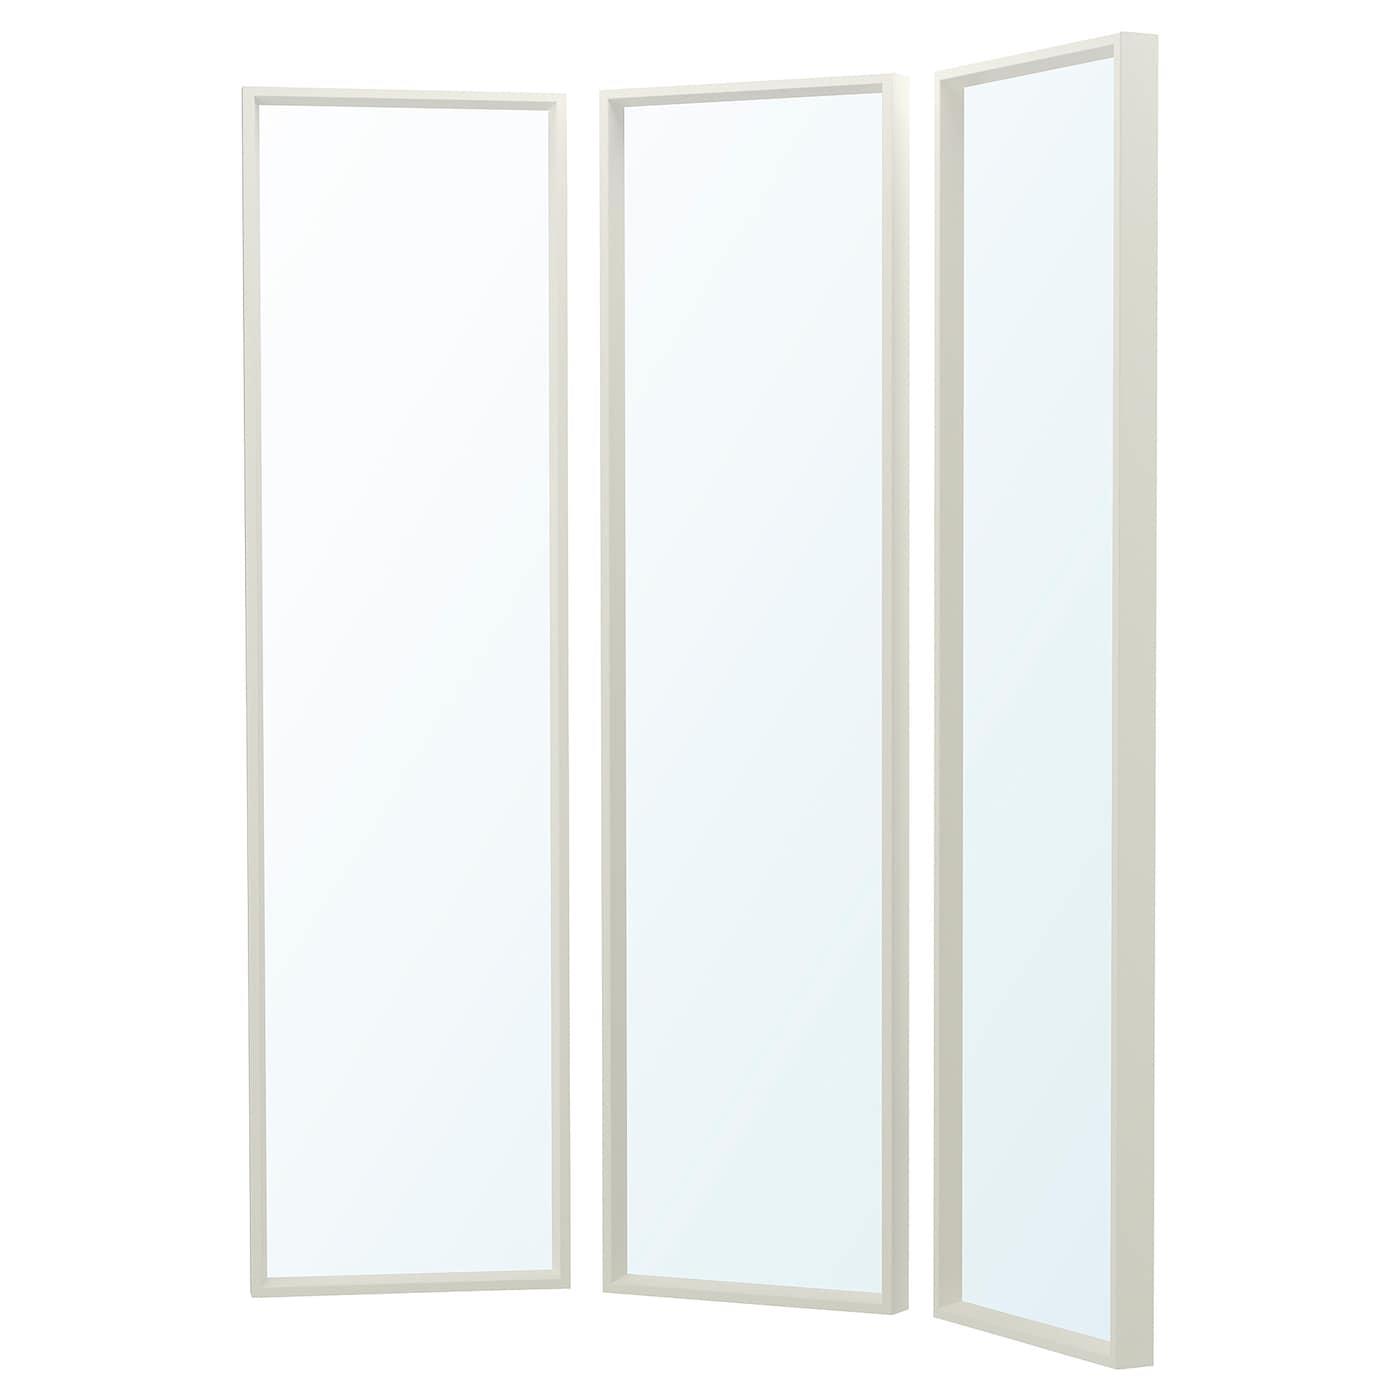 Nissedal mirror combination white 130x150 cm ikea for Miroir nissedal